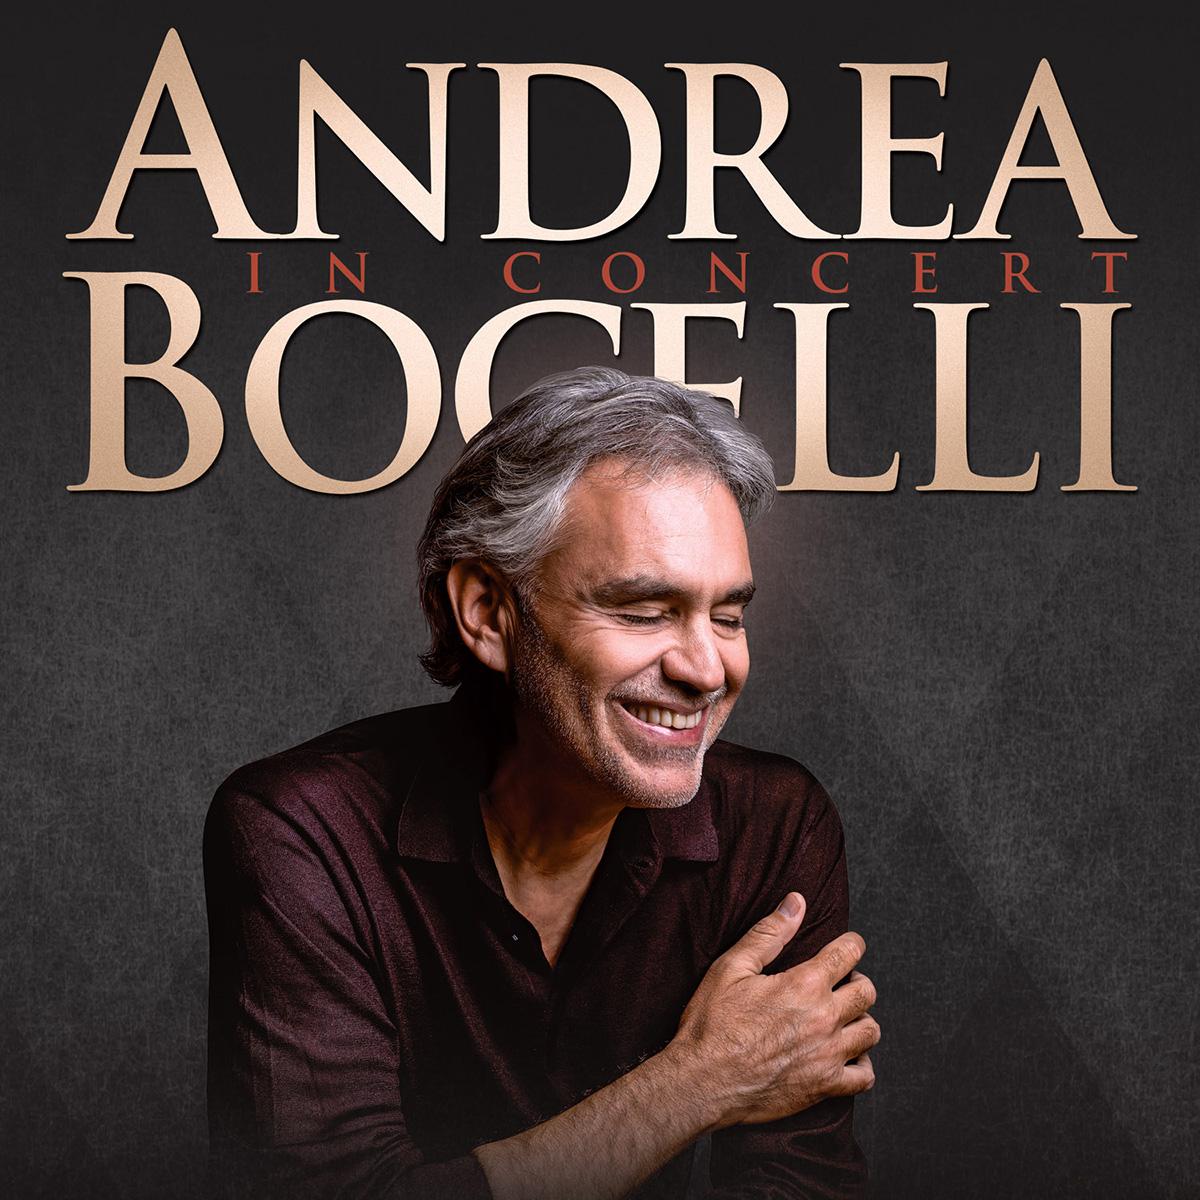 Andrea-Bocelli-Concert